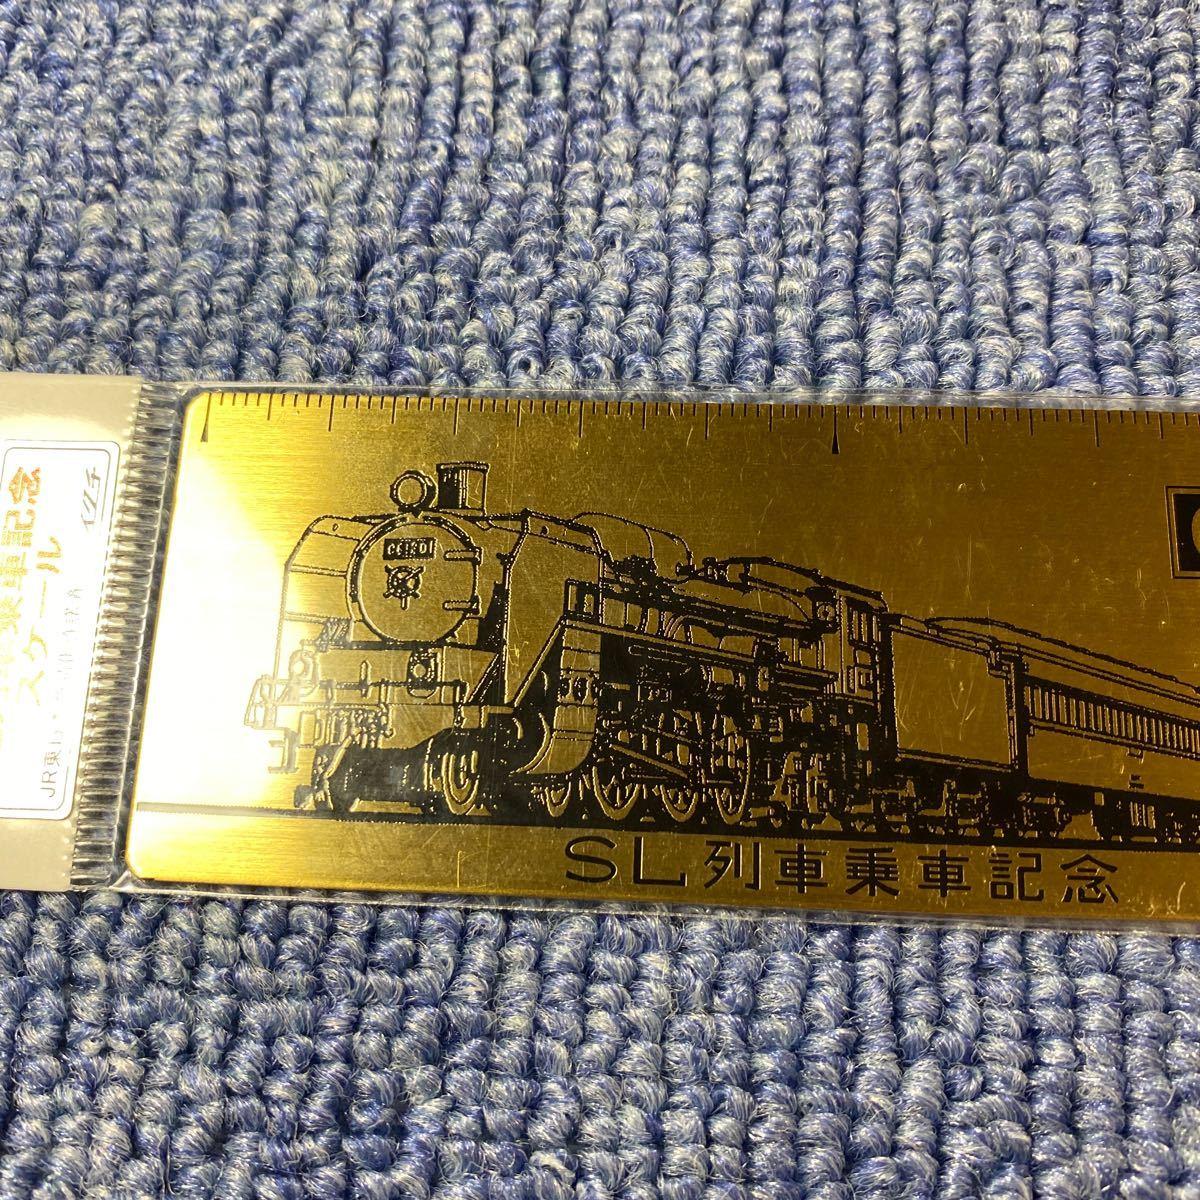 SL列車乗車記念 イクチ C6120 蒸気機関車 ゴールド 金属 定規 JR東日本承認 電車 鉄道グッズ コレクション レア 未使用_画像4